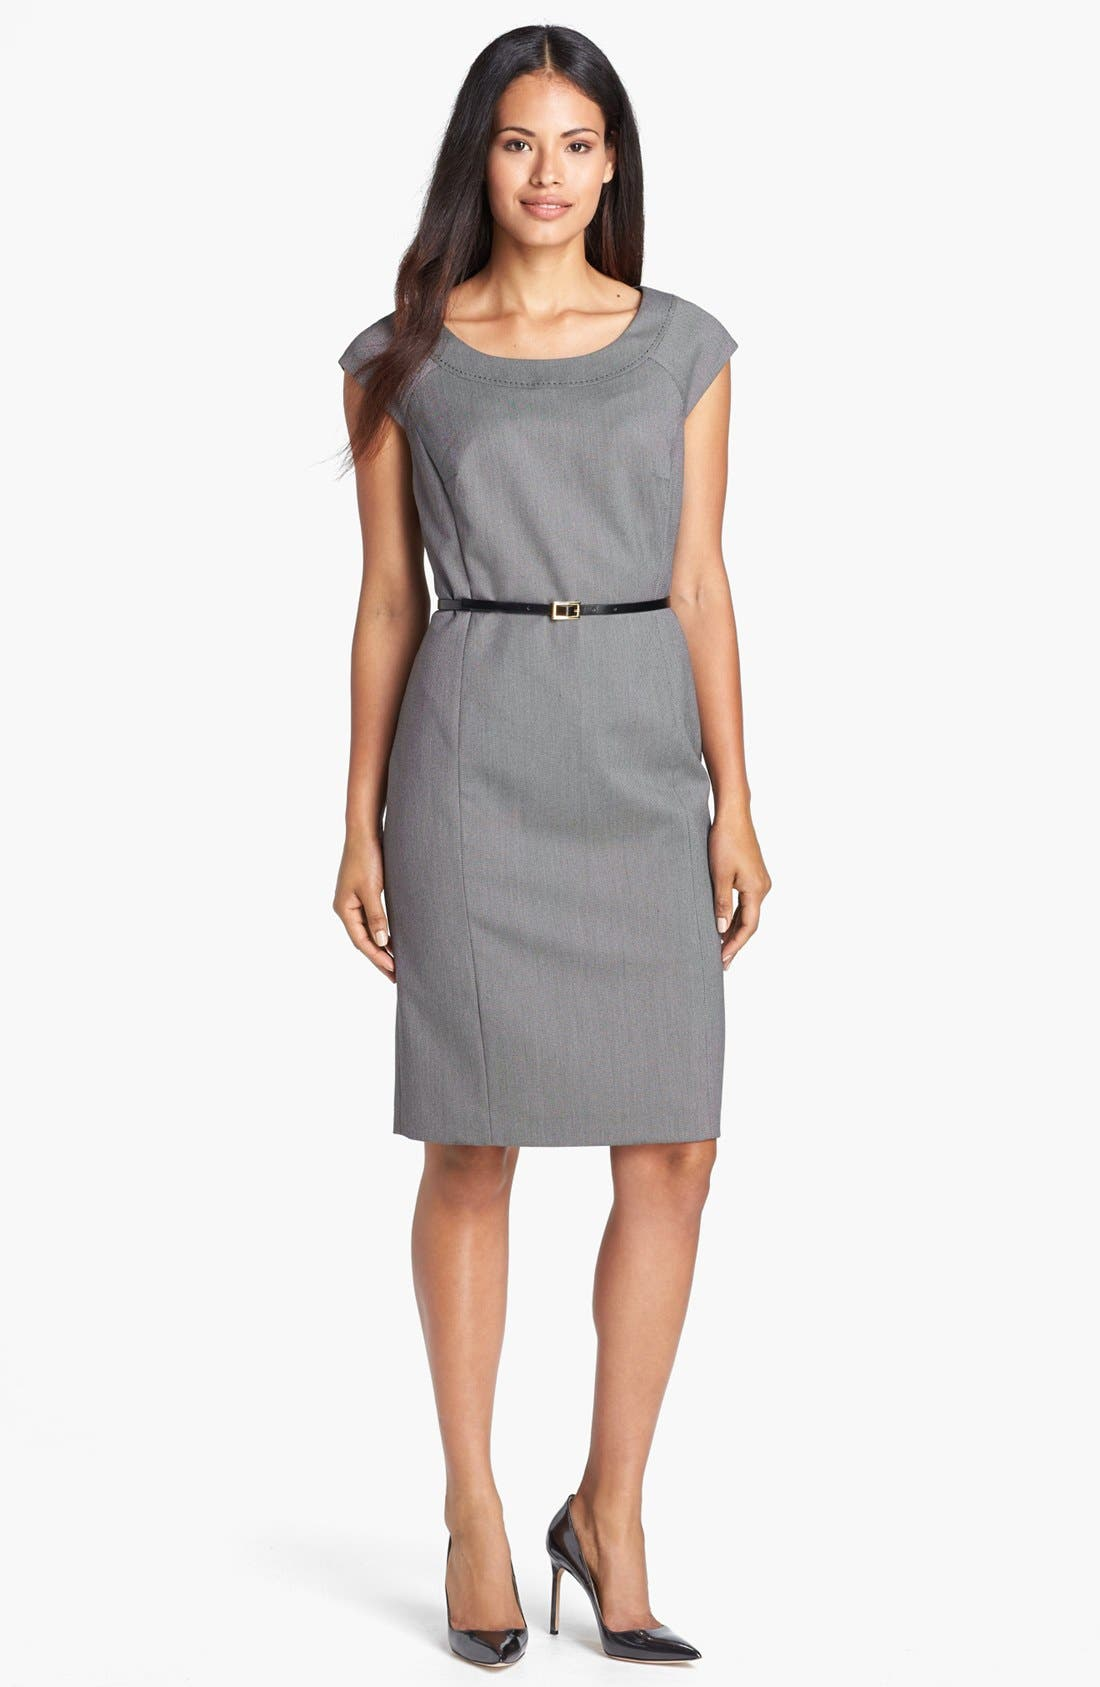 Alternate Image 1 Selected - Jones New York 'Brooke - Birdseye' Cap Sleeve Dress